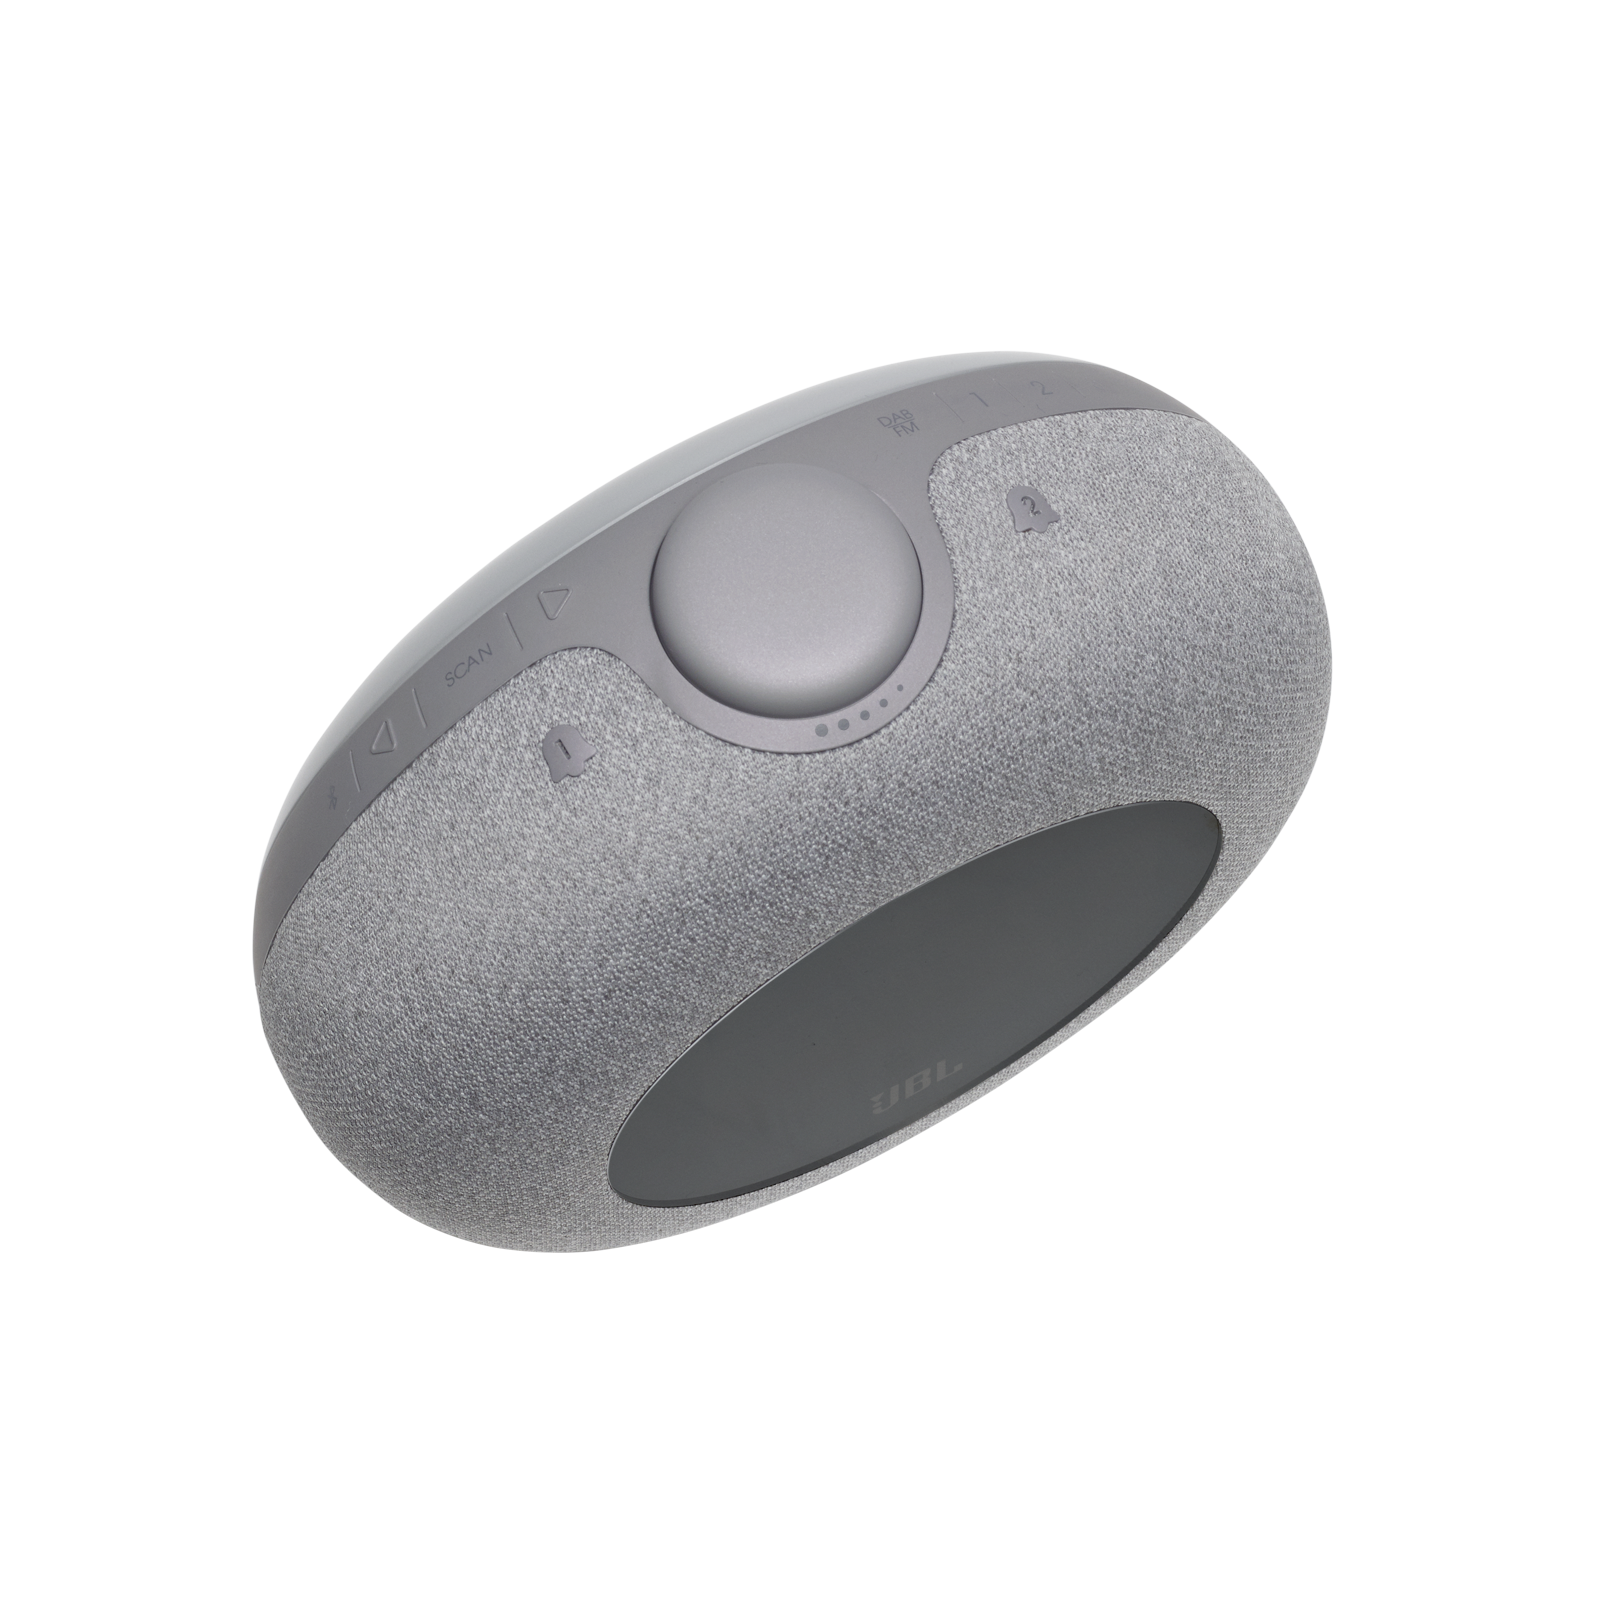 JBL Horizon 2 DAB - Grey - Bluetooth clock radio speaker with DAB/DAB+/FM - Detailshot 2